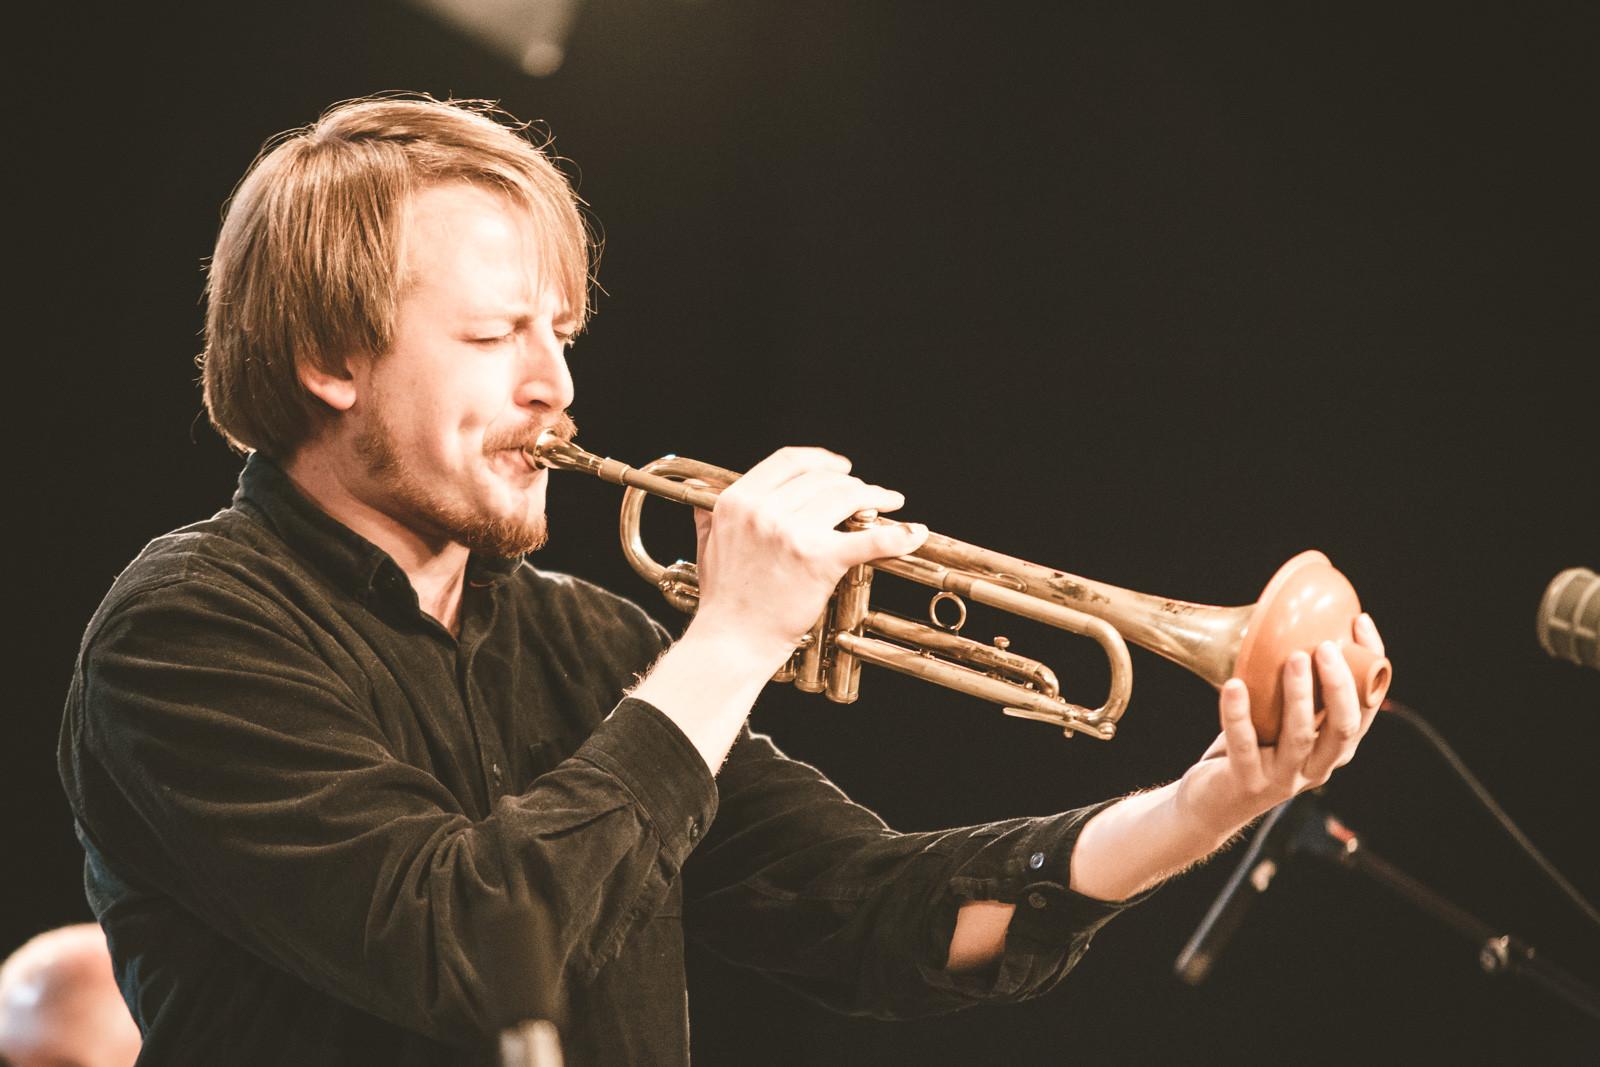 Cecilie Grundt Quintet + Nils-Olav Johansen, Live at Dokkhuset 29.03.19. Photo: Juliane Schütz